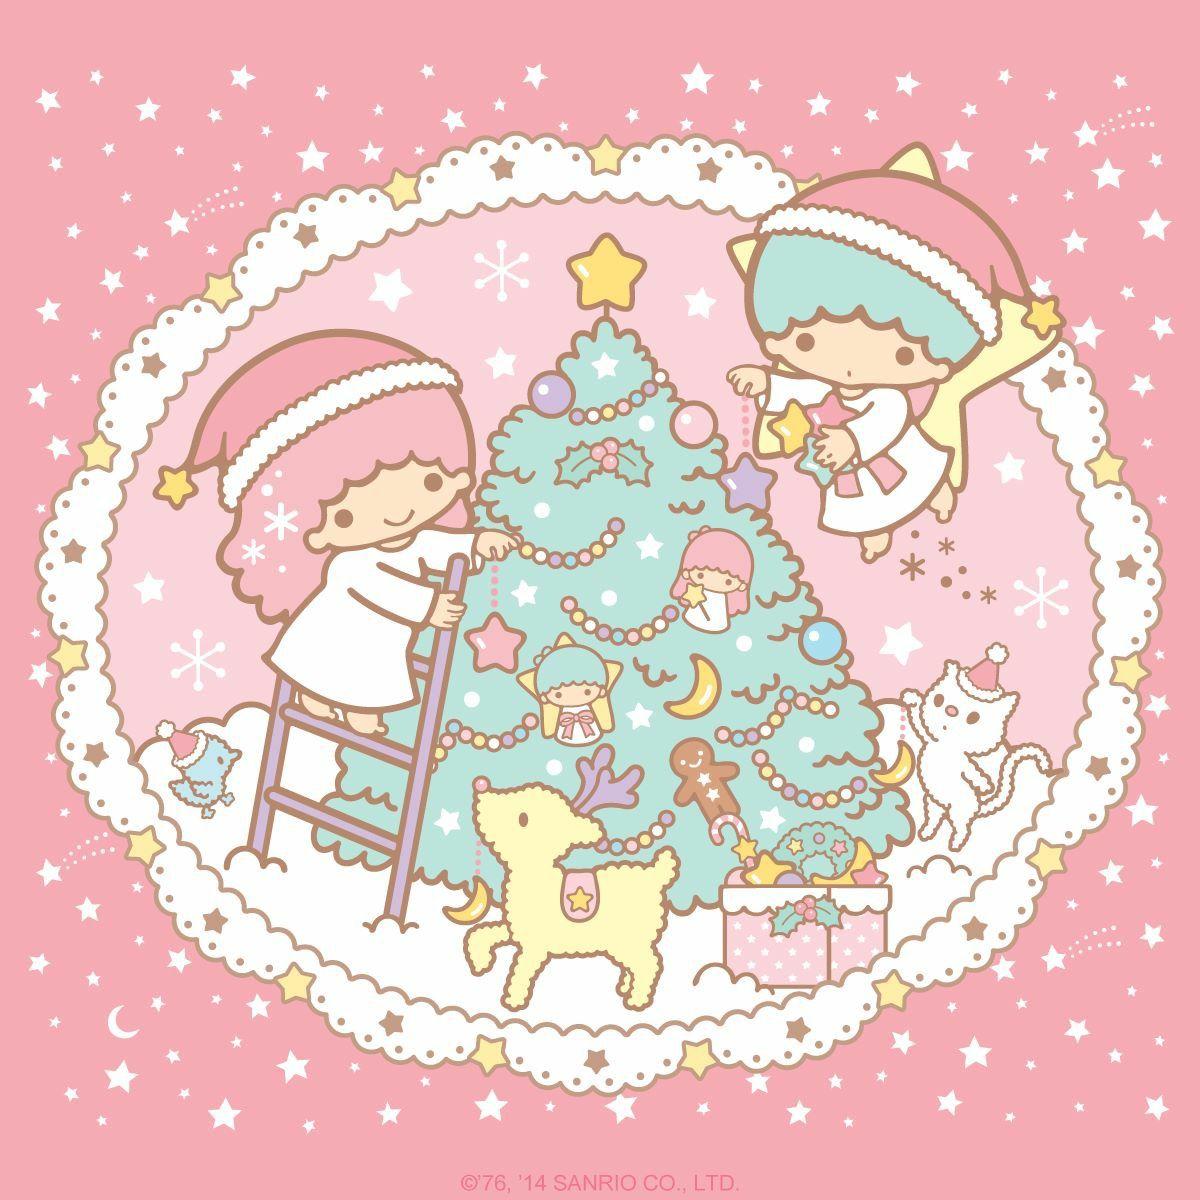 Good Wallpaper Hello Kitty Strawberry - dec2d089b57a45d8144e0a2430c147f1  2018_3135.jpg